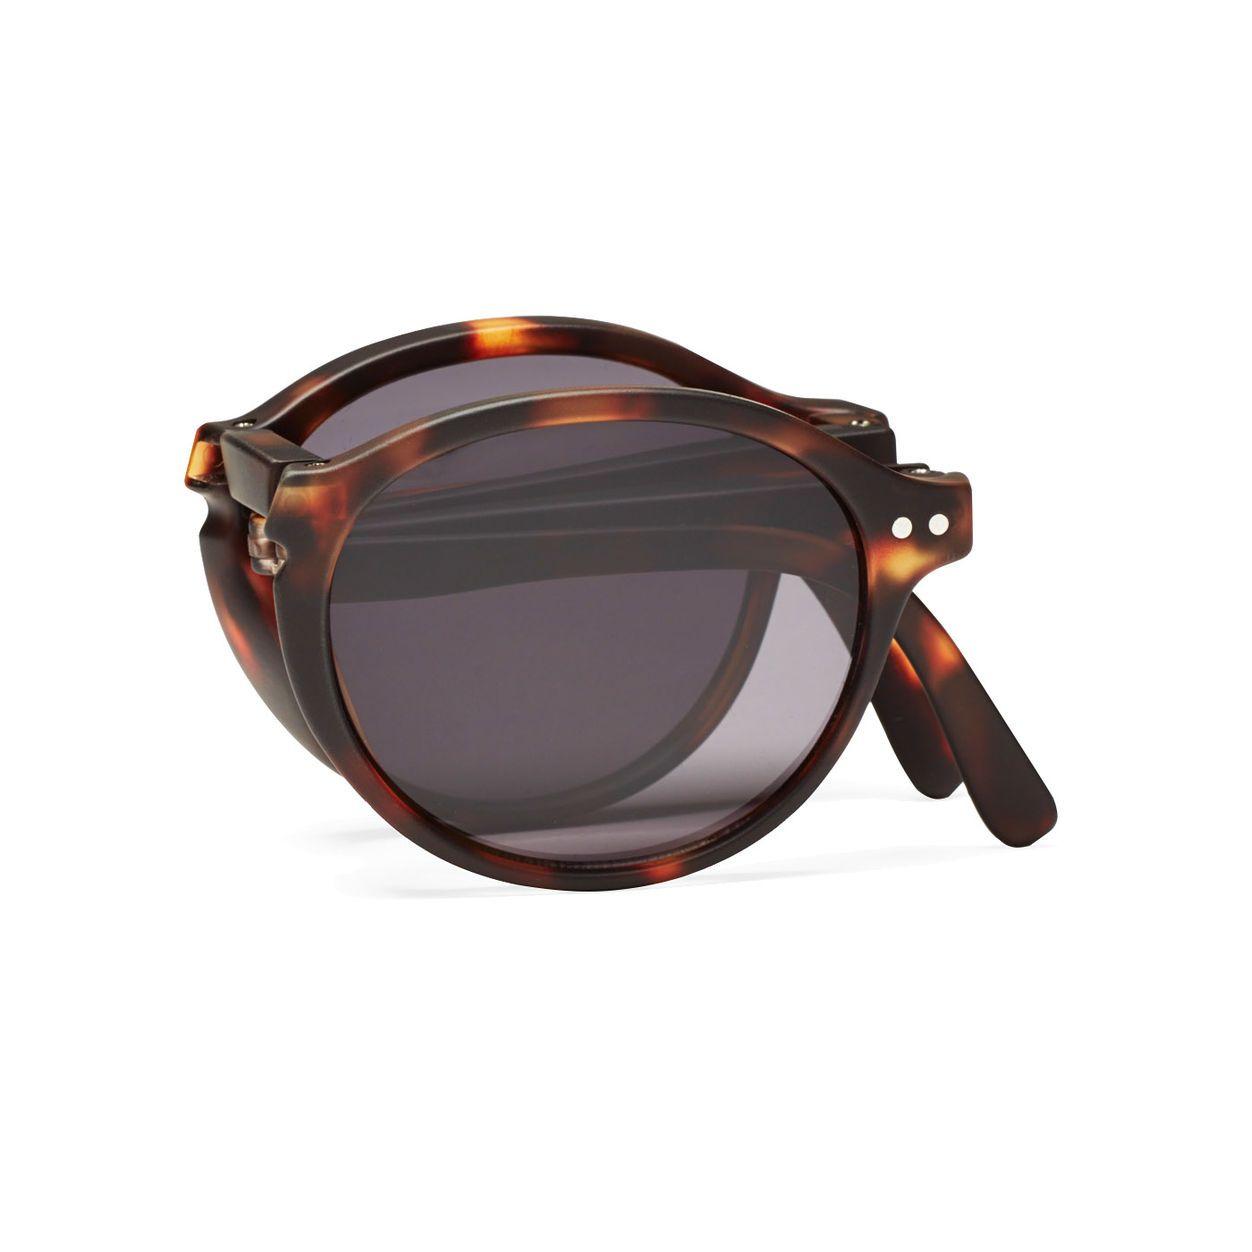 2c811423b8e3 IZIPIZI Foldable Sunglasses #F | My collection | Sunglasses, Glasses ...